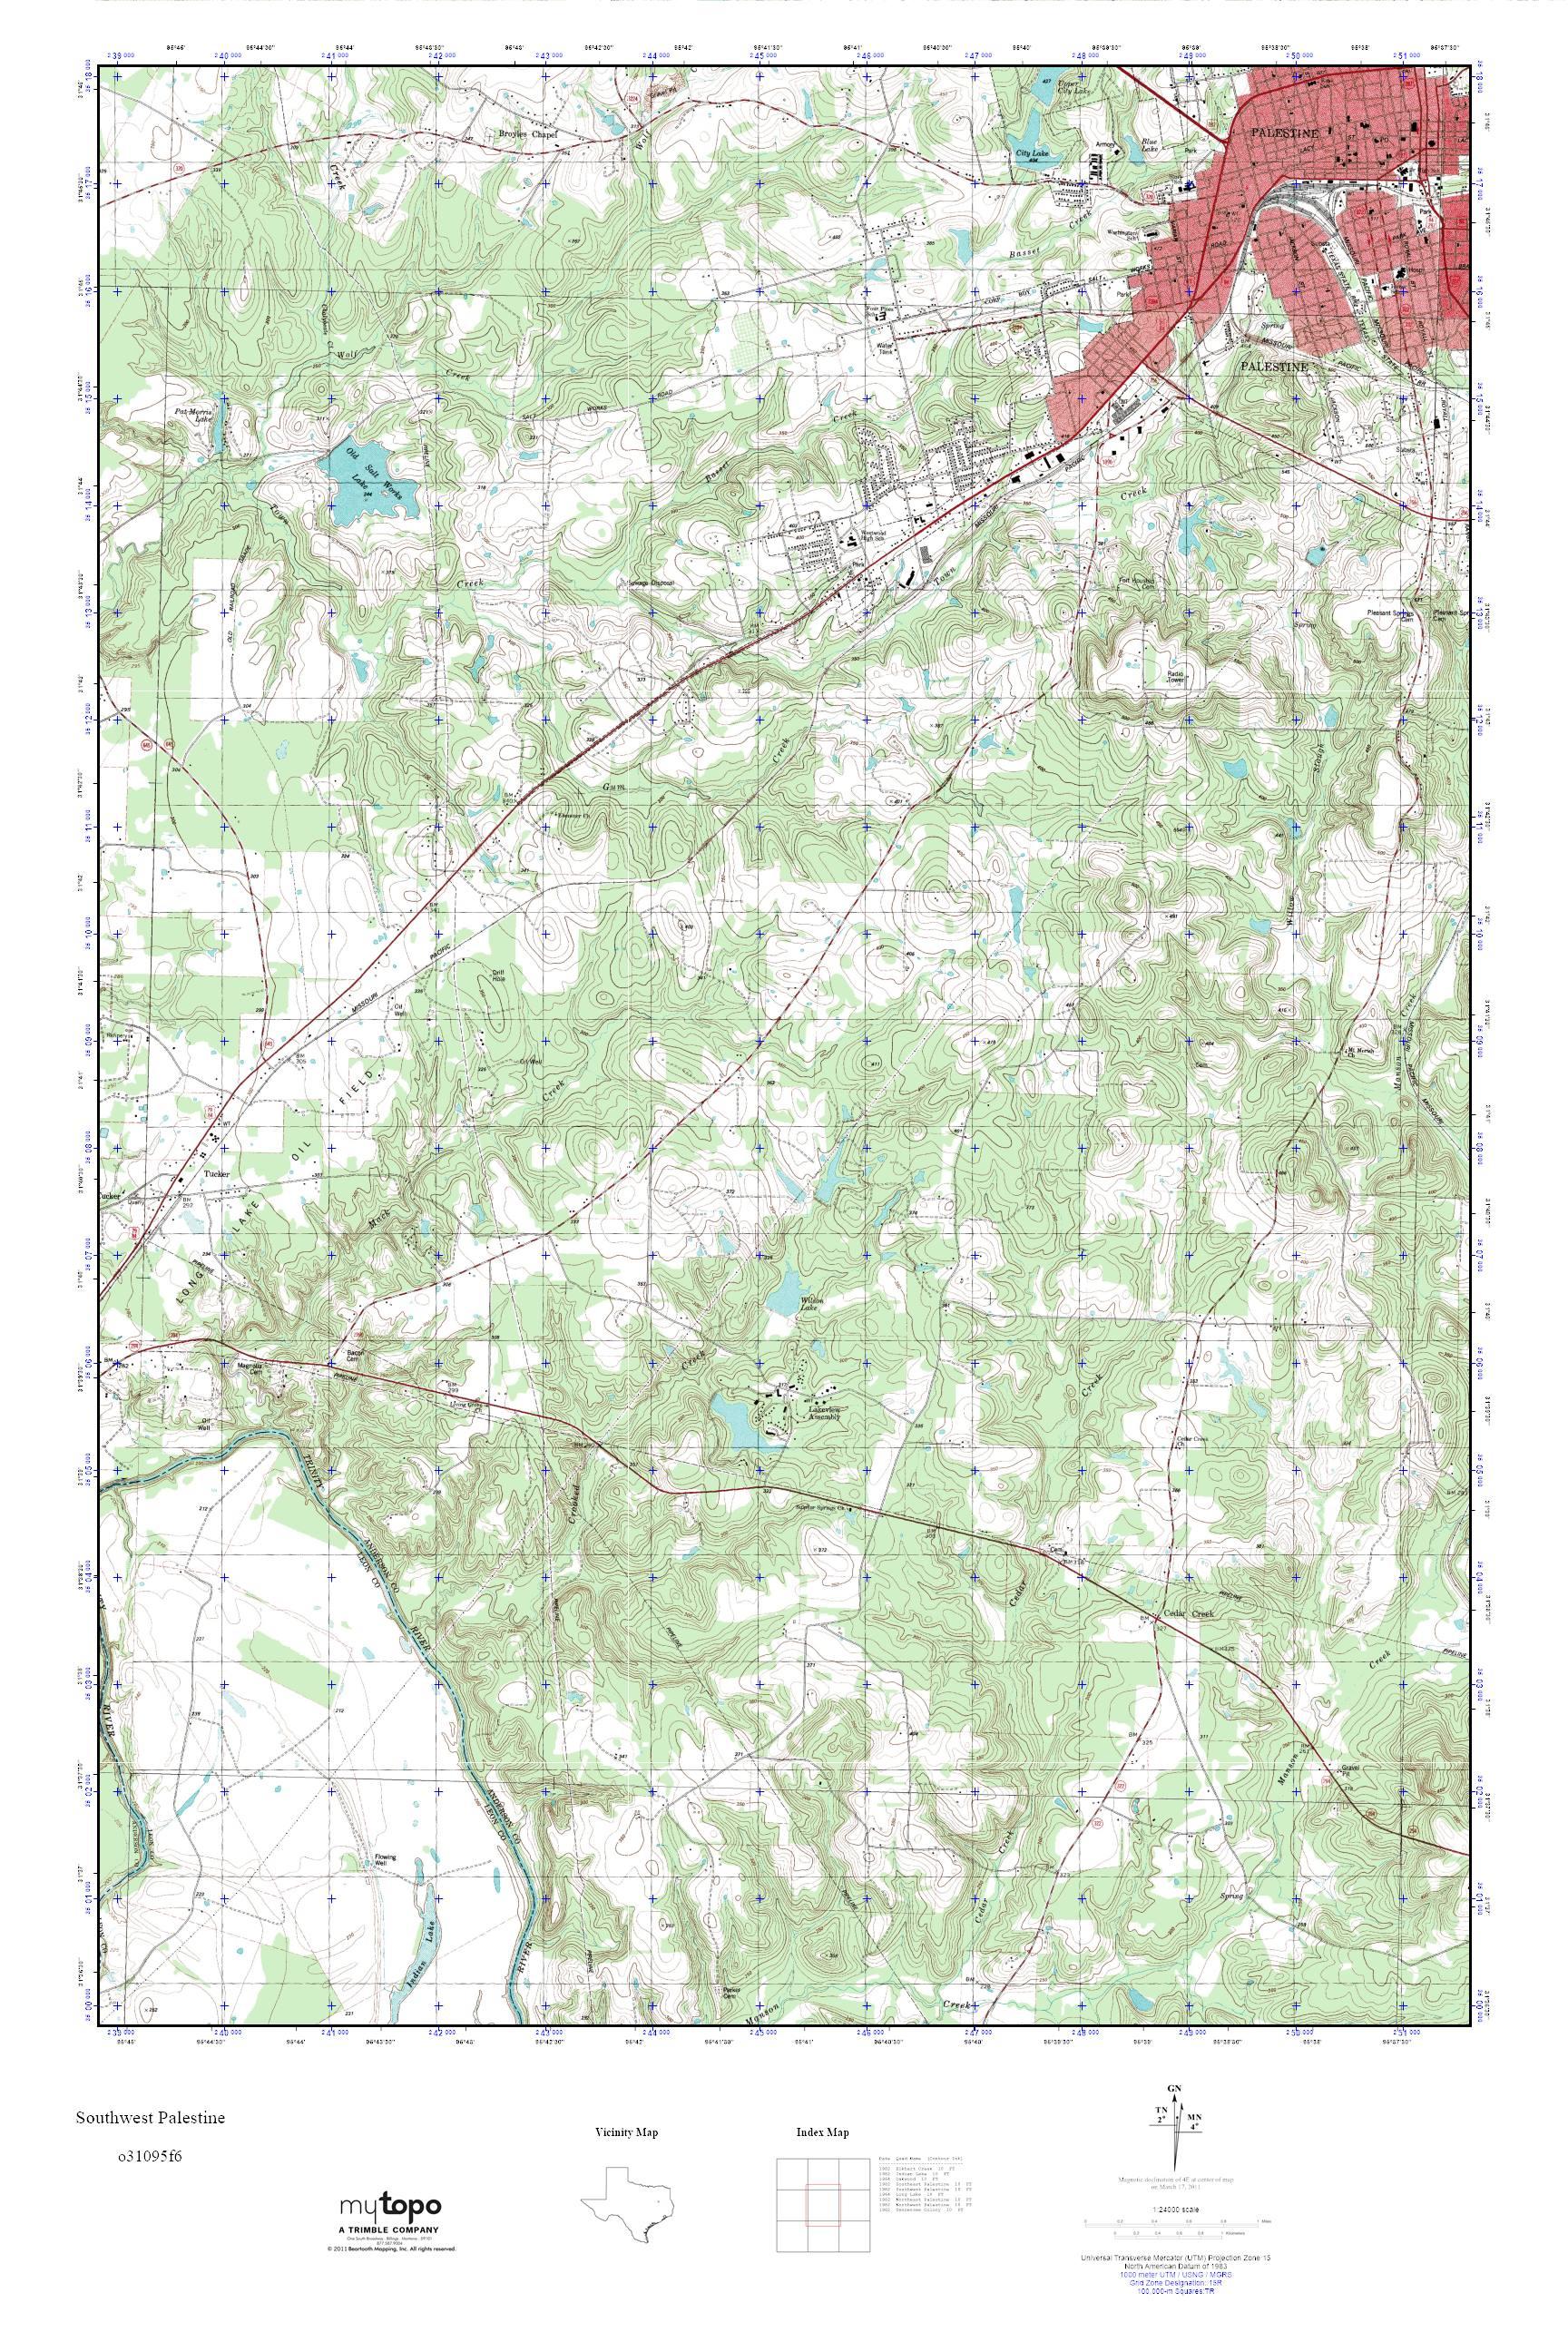 Mytopo Southwest Palestine, Texas Usgs Quad Topo Map - Palestine Texas Map